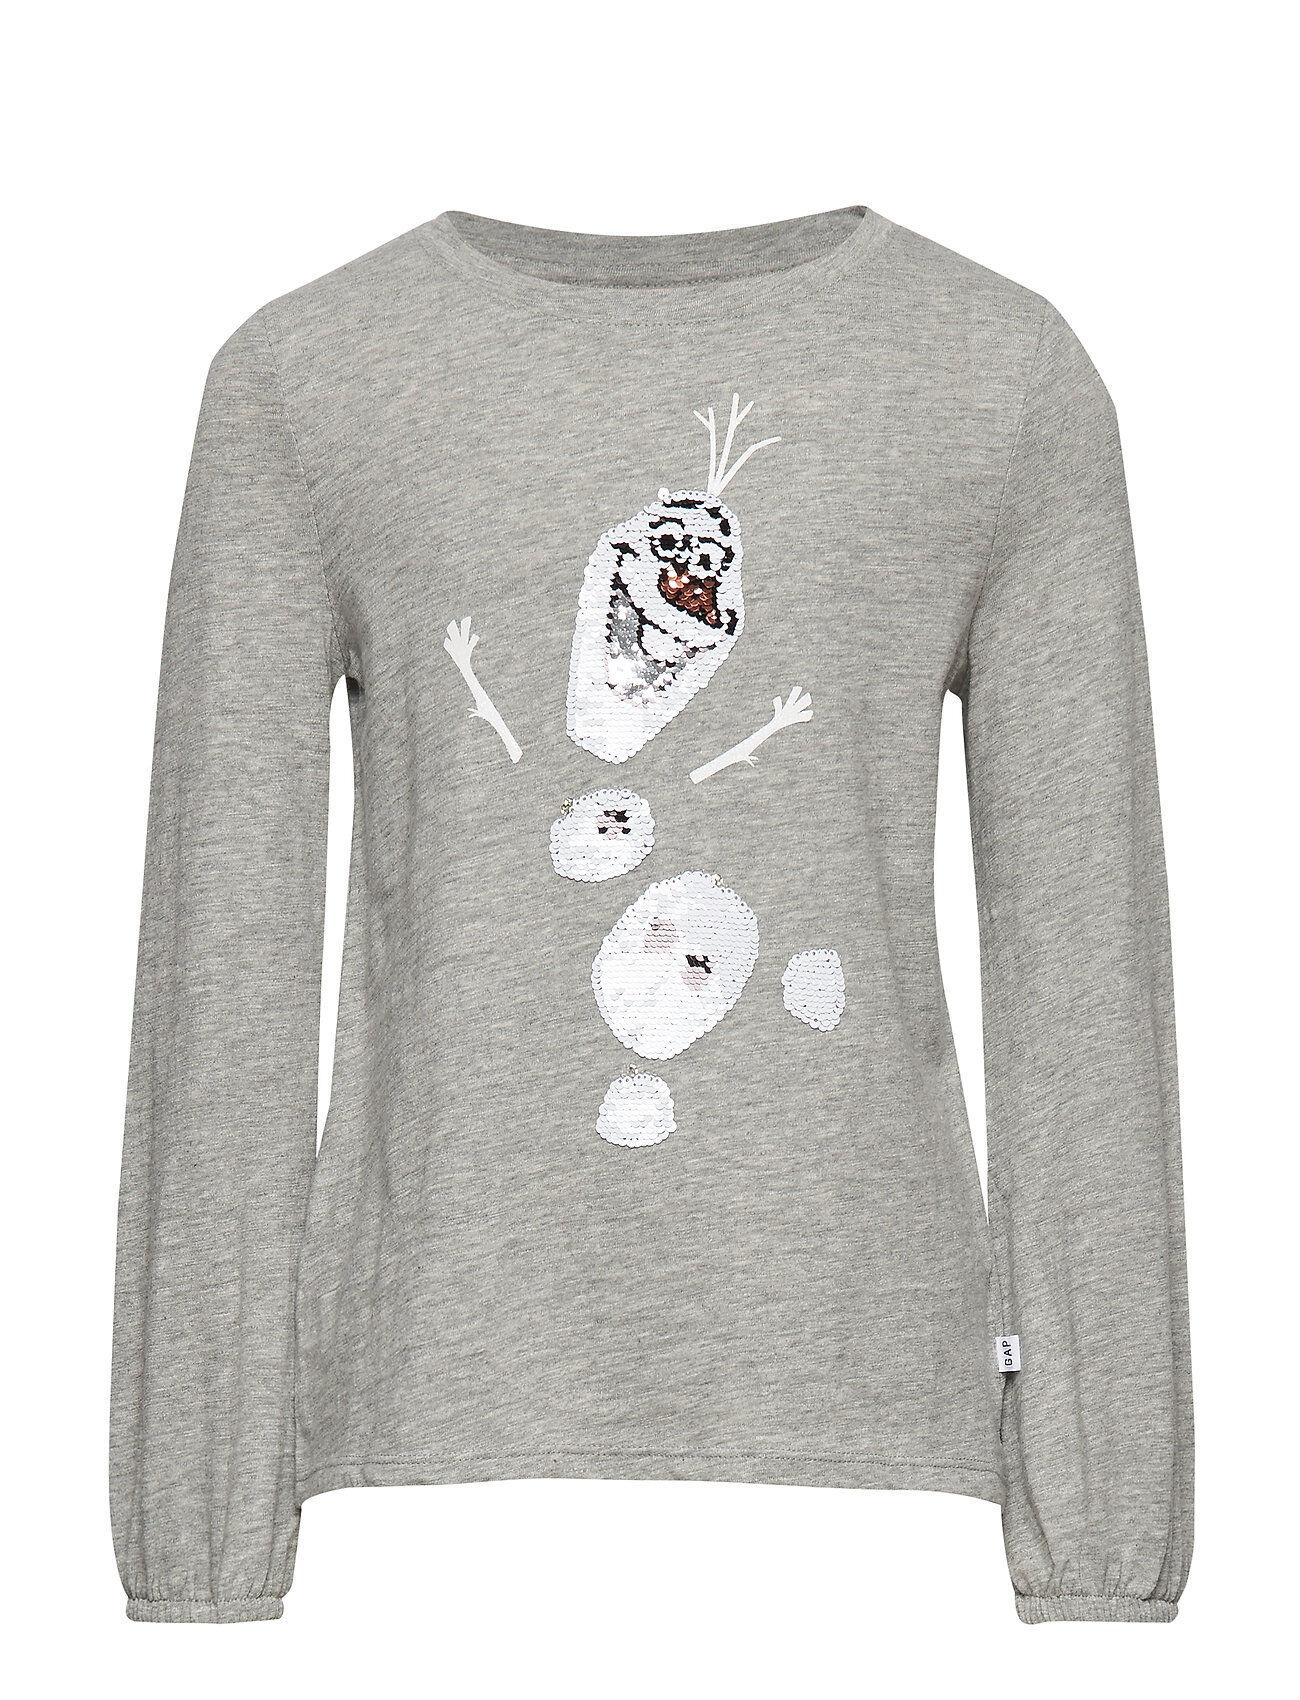 Gapkids   Disney Frozen 2 Sequin T-Shirt T-shirts Long-sleeved T-shirts Harmaa GAP